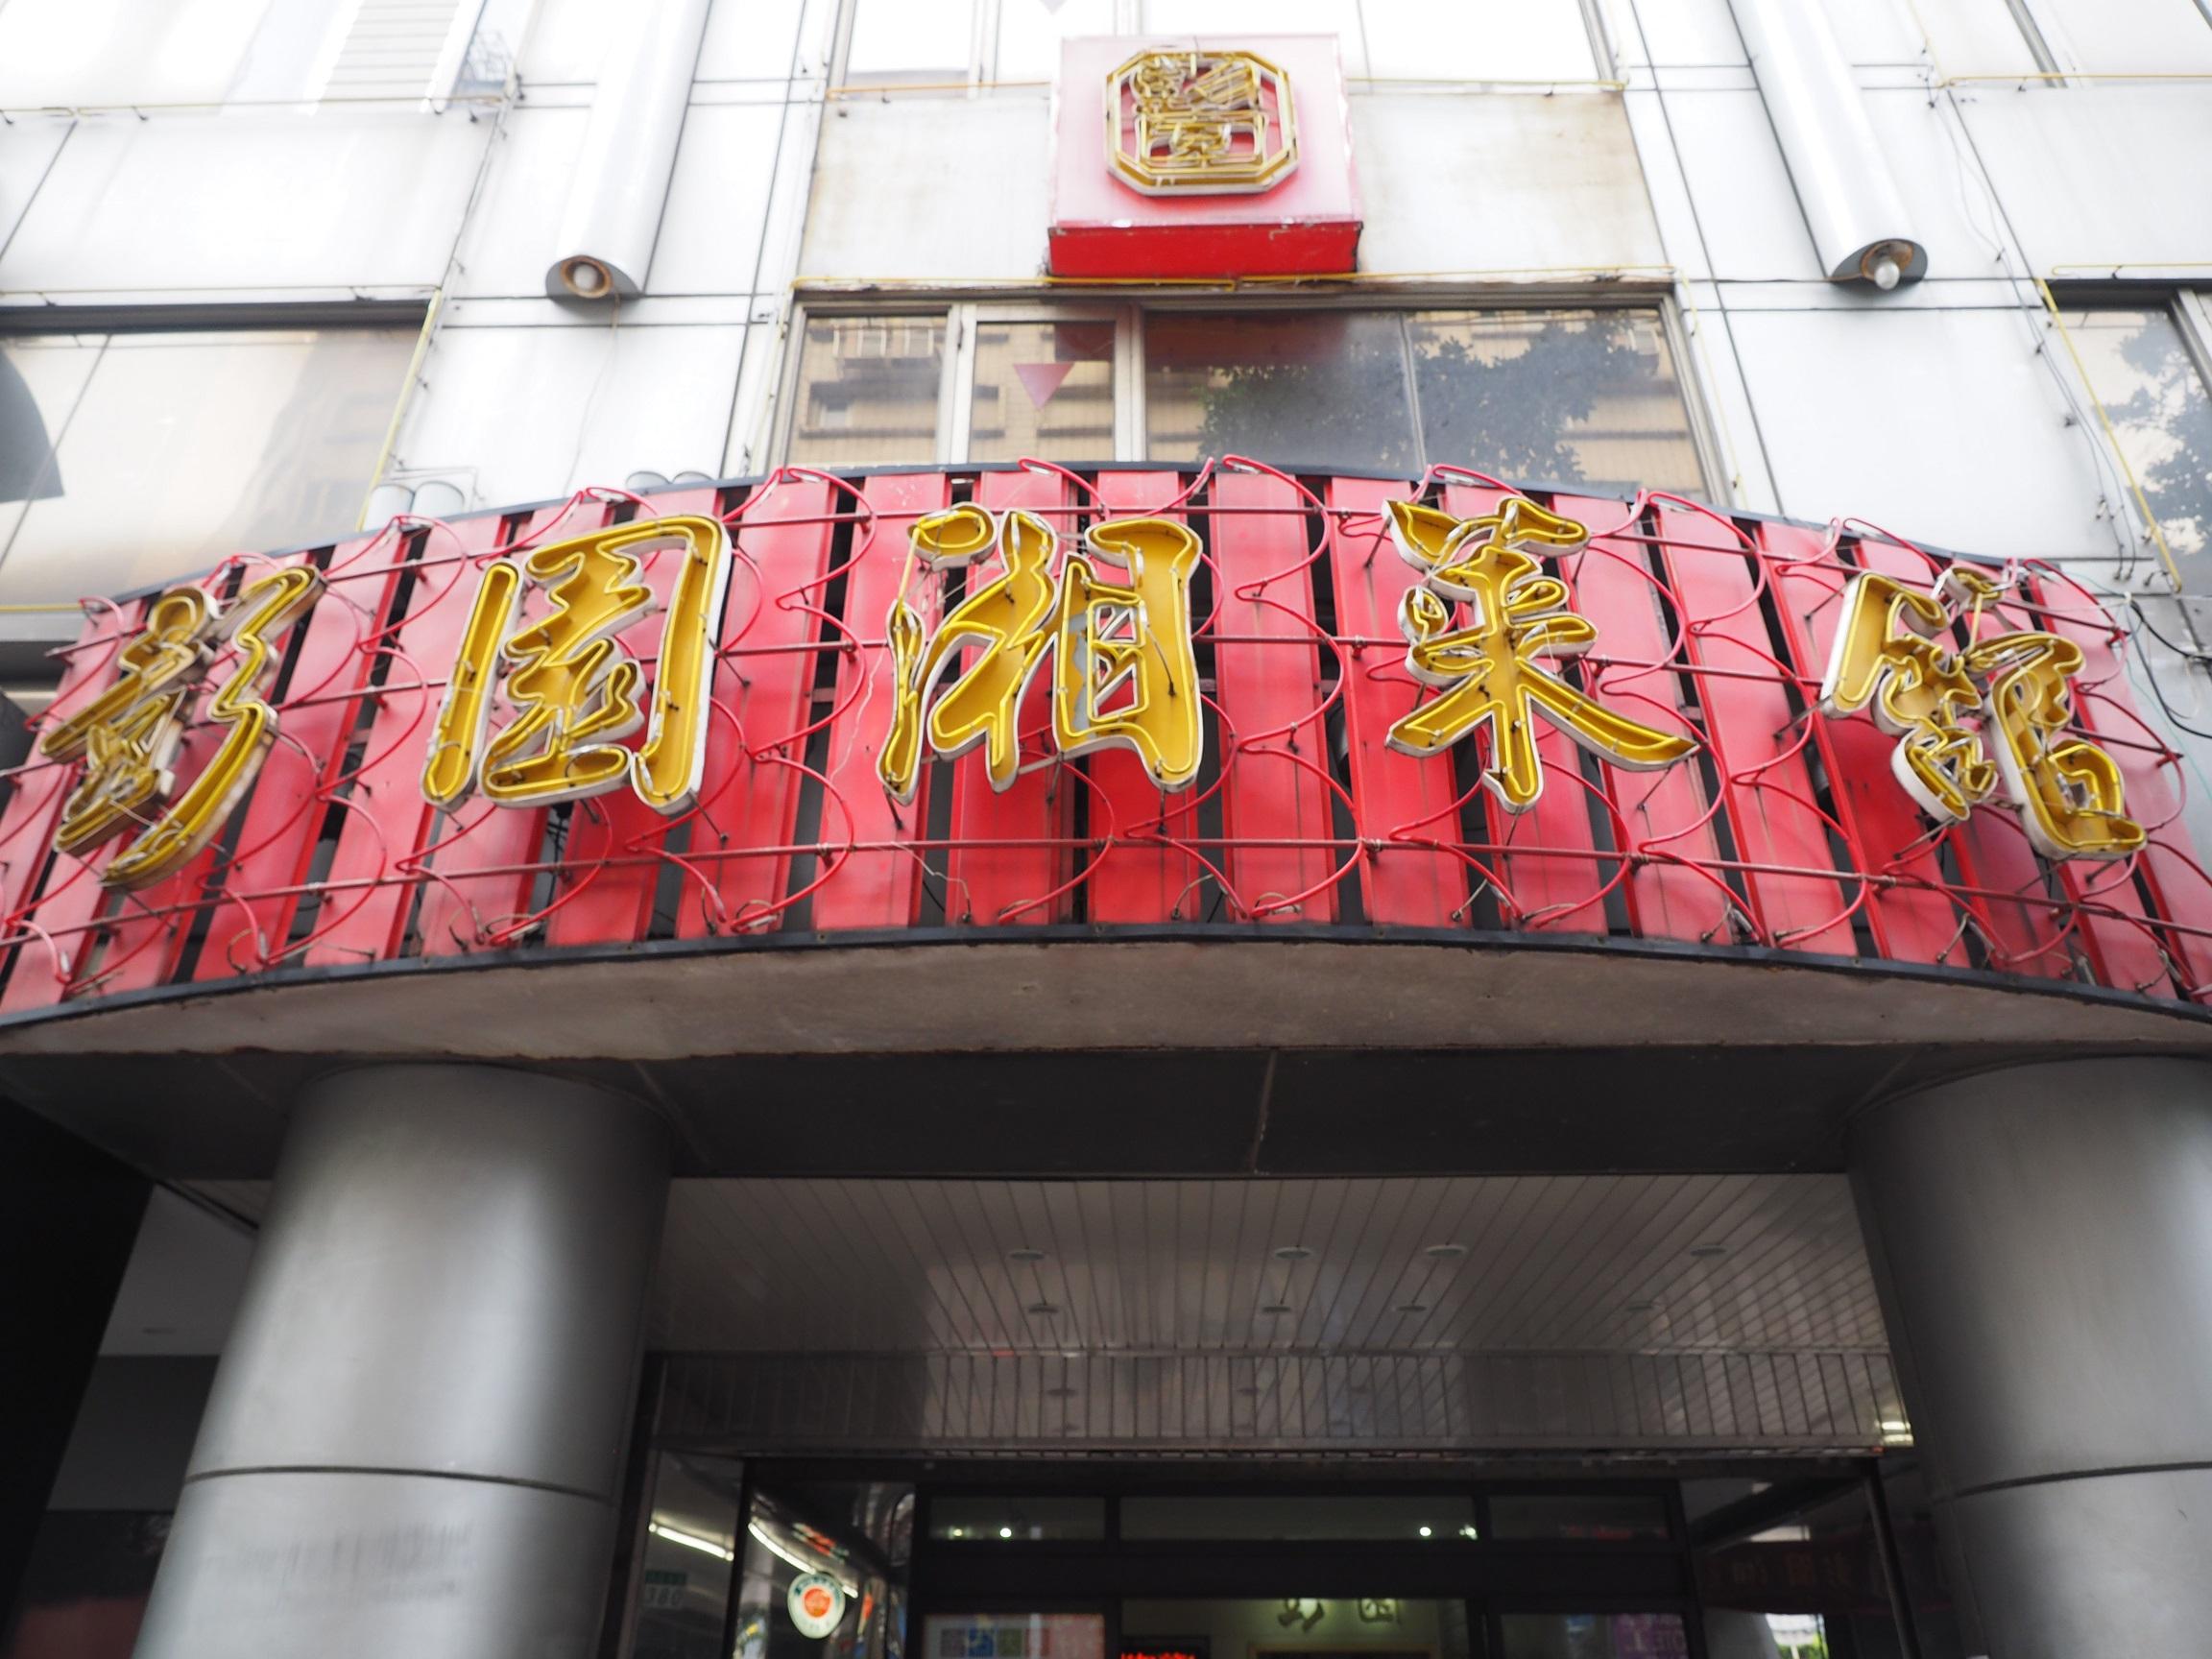 Peng's Garden: The Mecca of General Tso's Chicken in Taipei